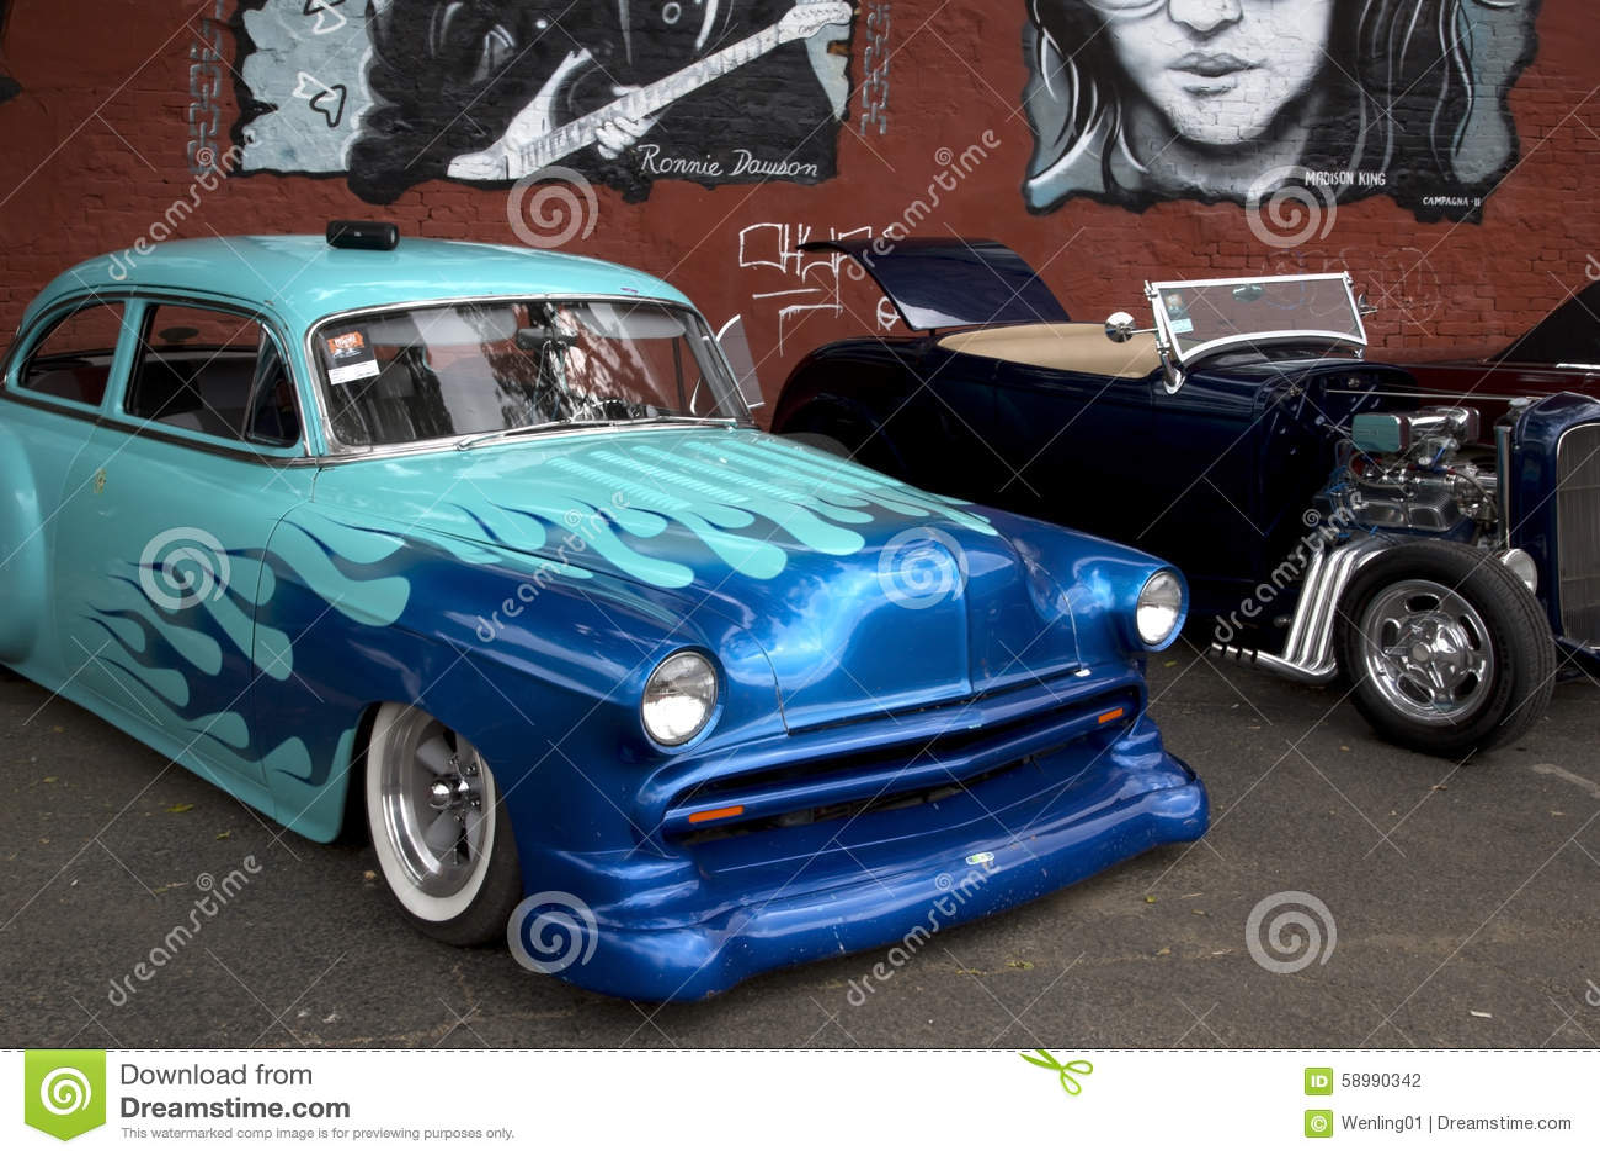 Nice Vintage Car Show In Dallas Editorial Photography Image Of - Car show dallas